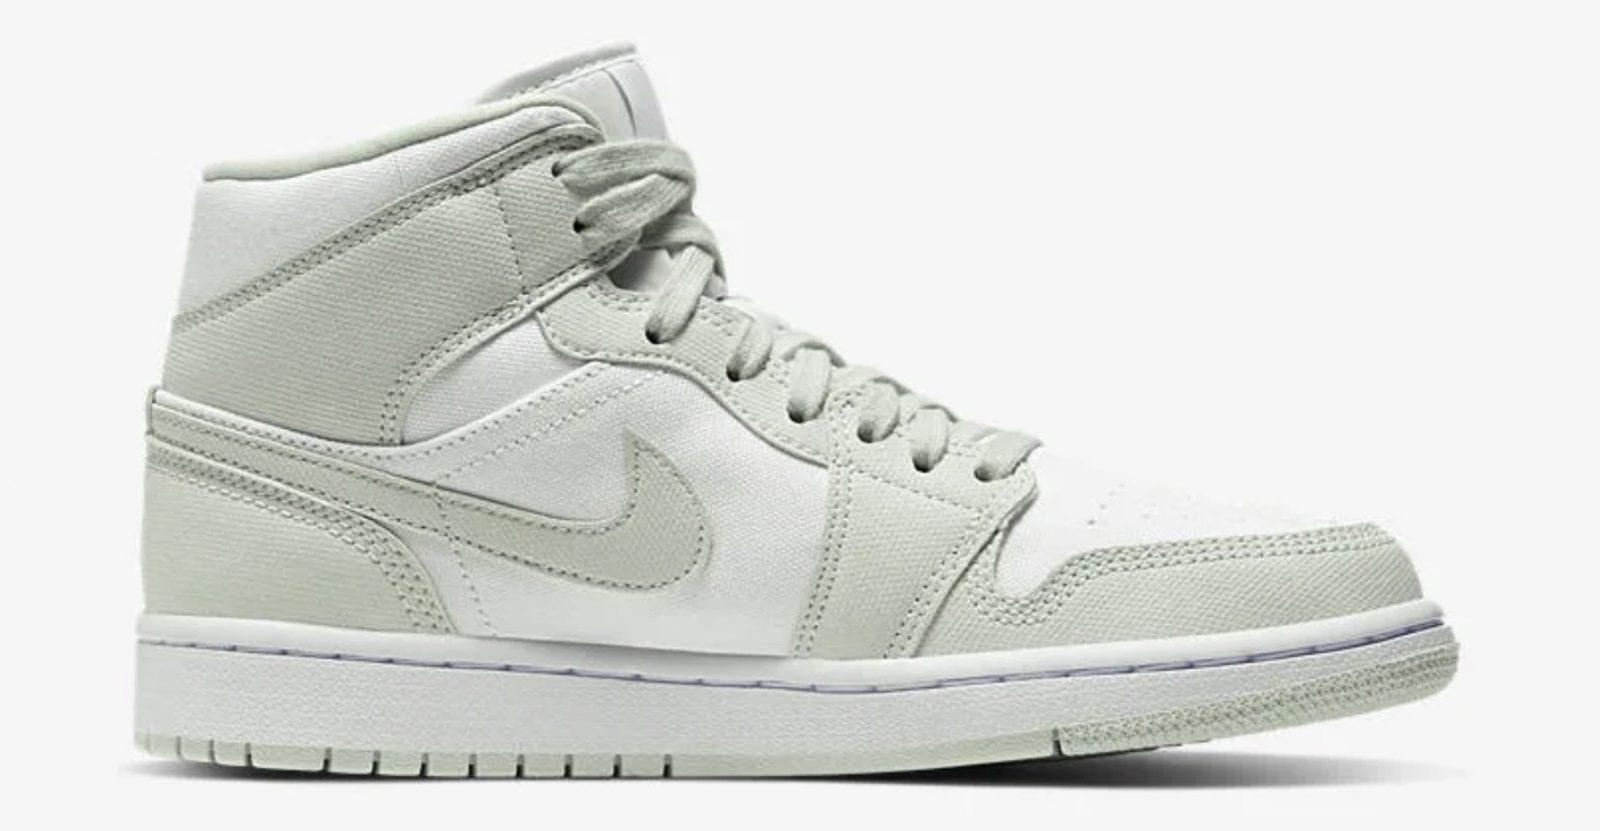 Pistachio Hues Create The Perfect Spring-Ready Nike Air Jordan 1 Mid 2 right